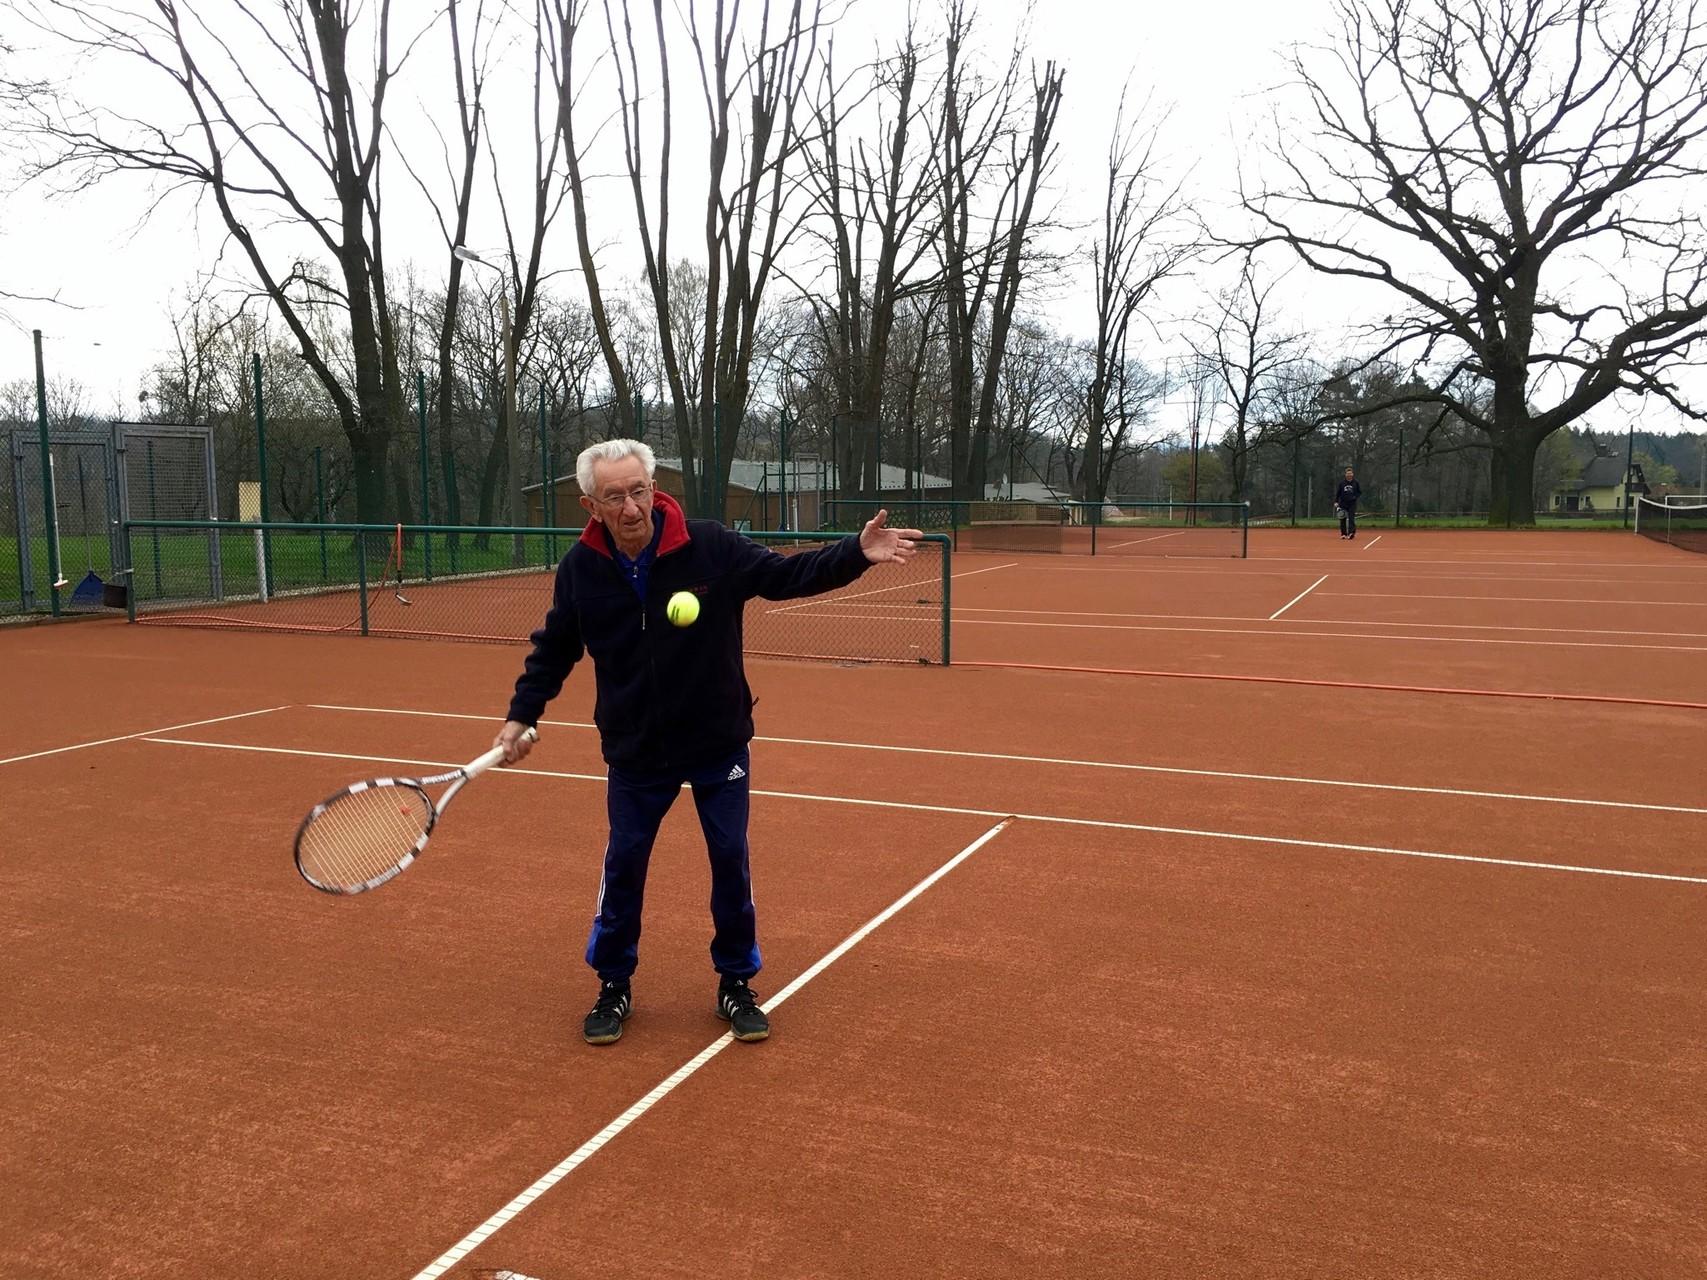 Alterspräsident Horst Schmidt spielt den ersten Ball der Saison